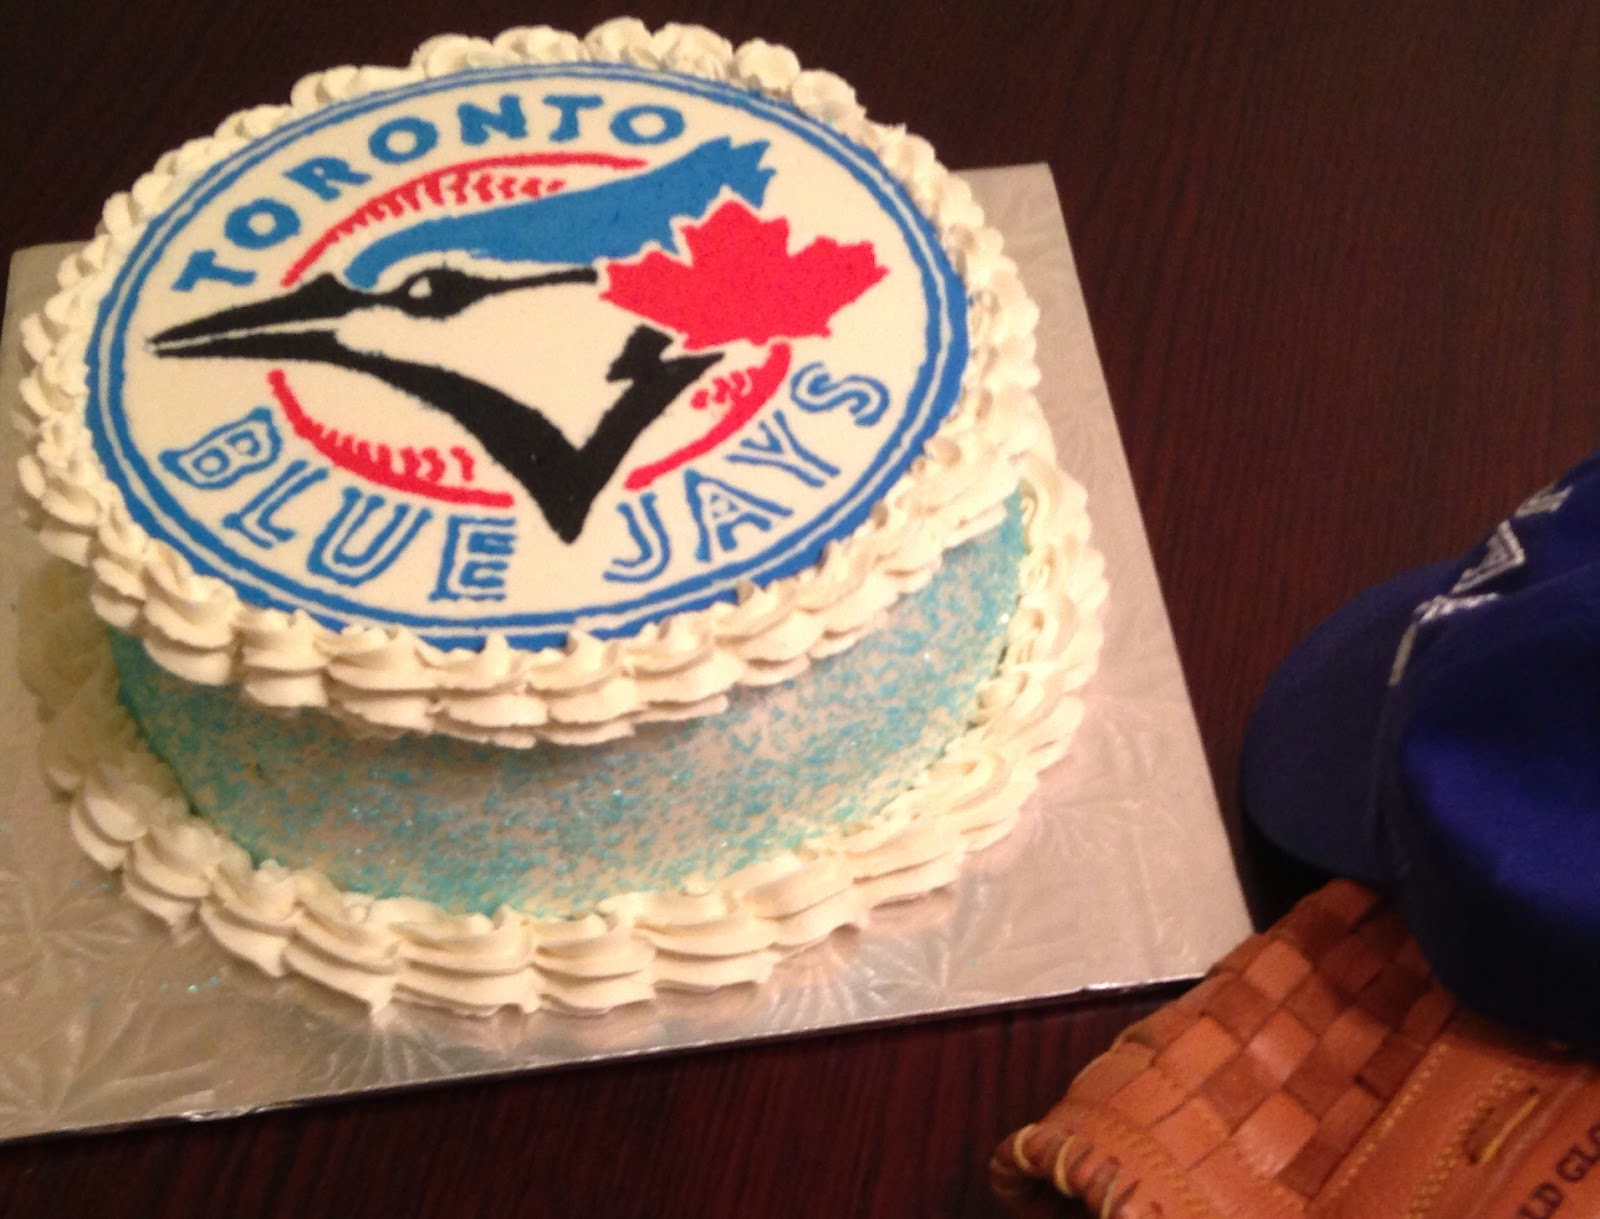 Crafting Baker Toronto Blue Jays Birthday Cake